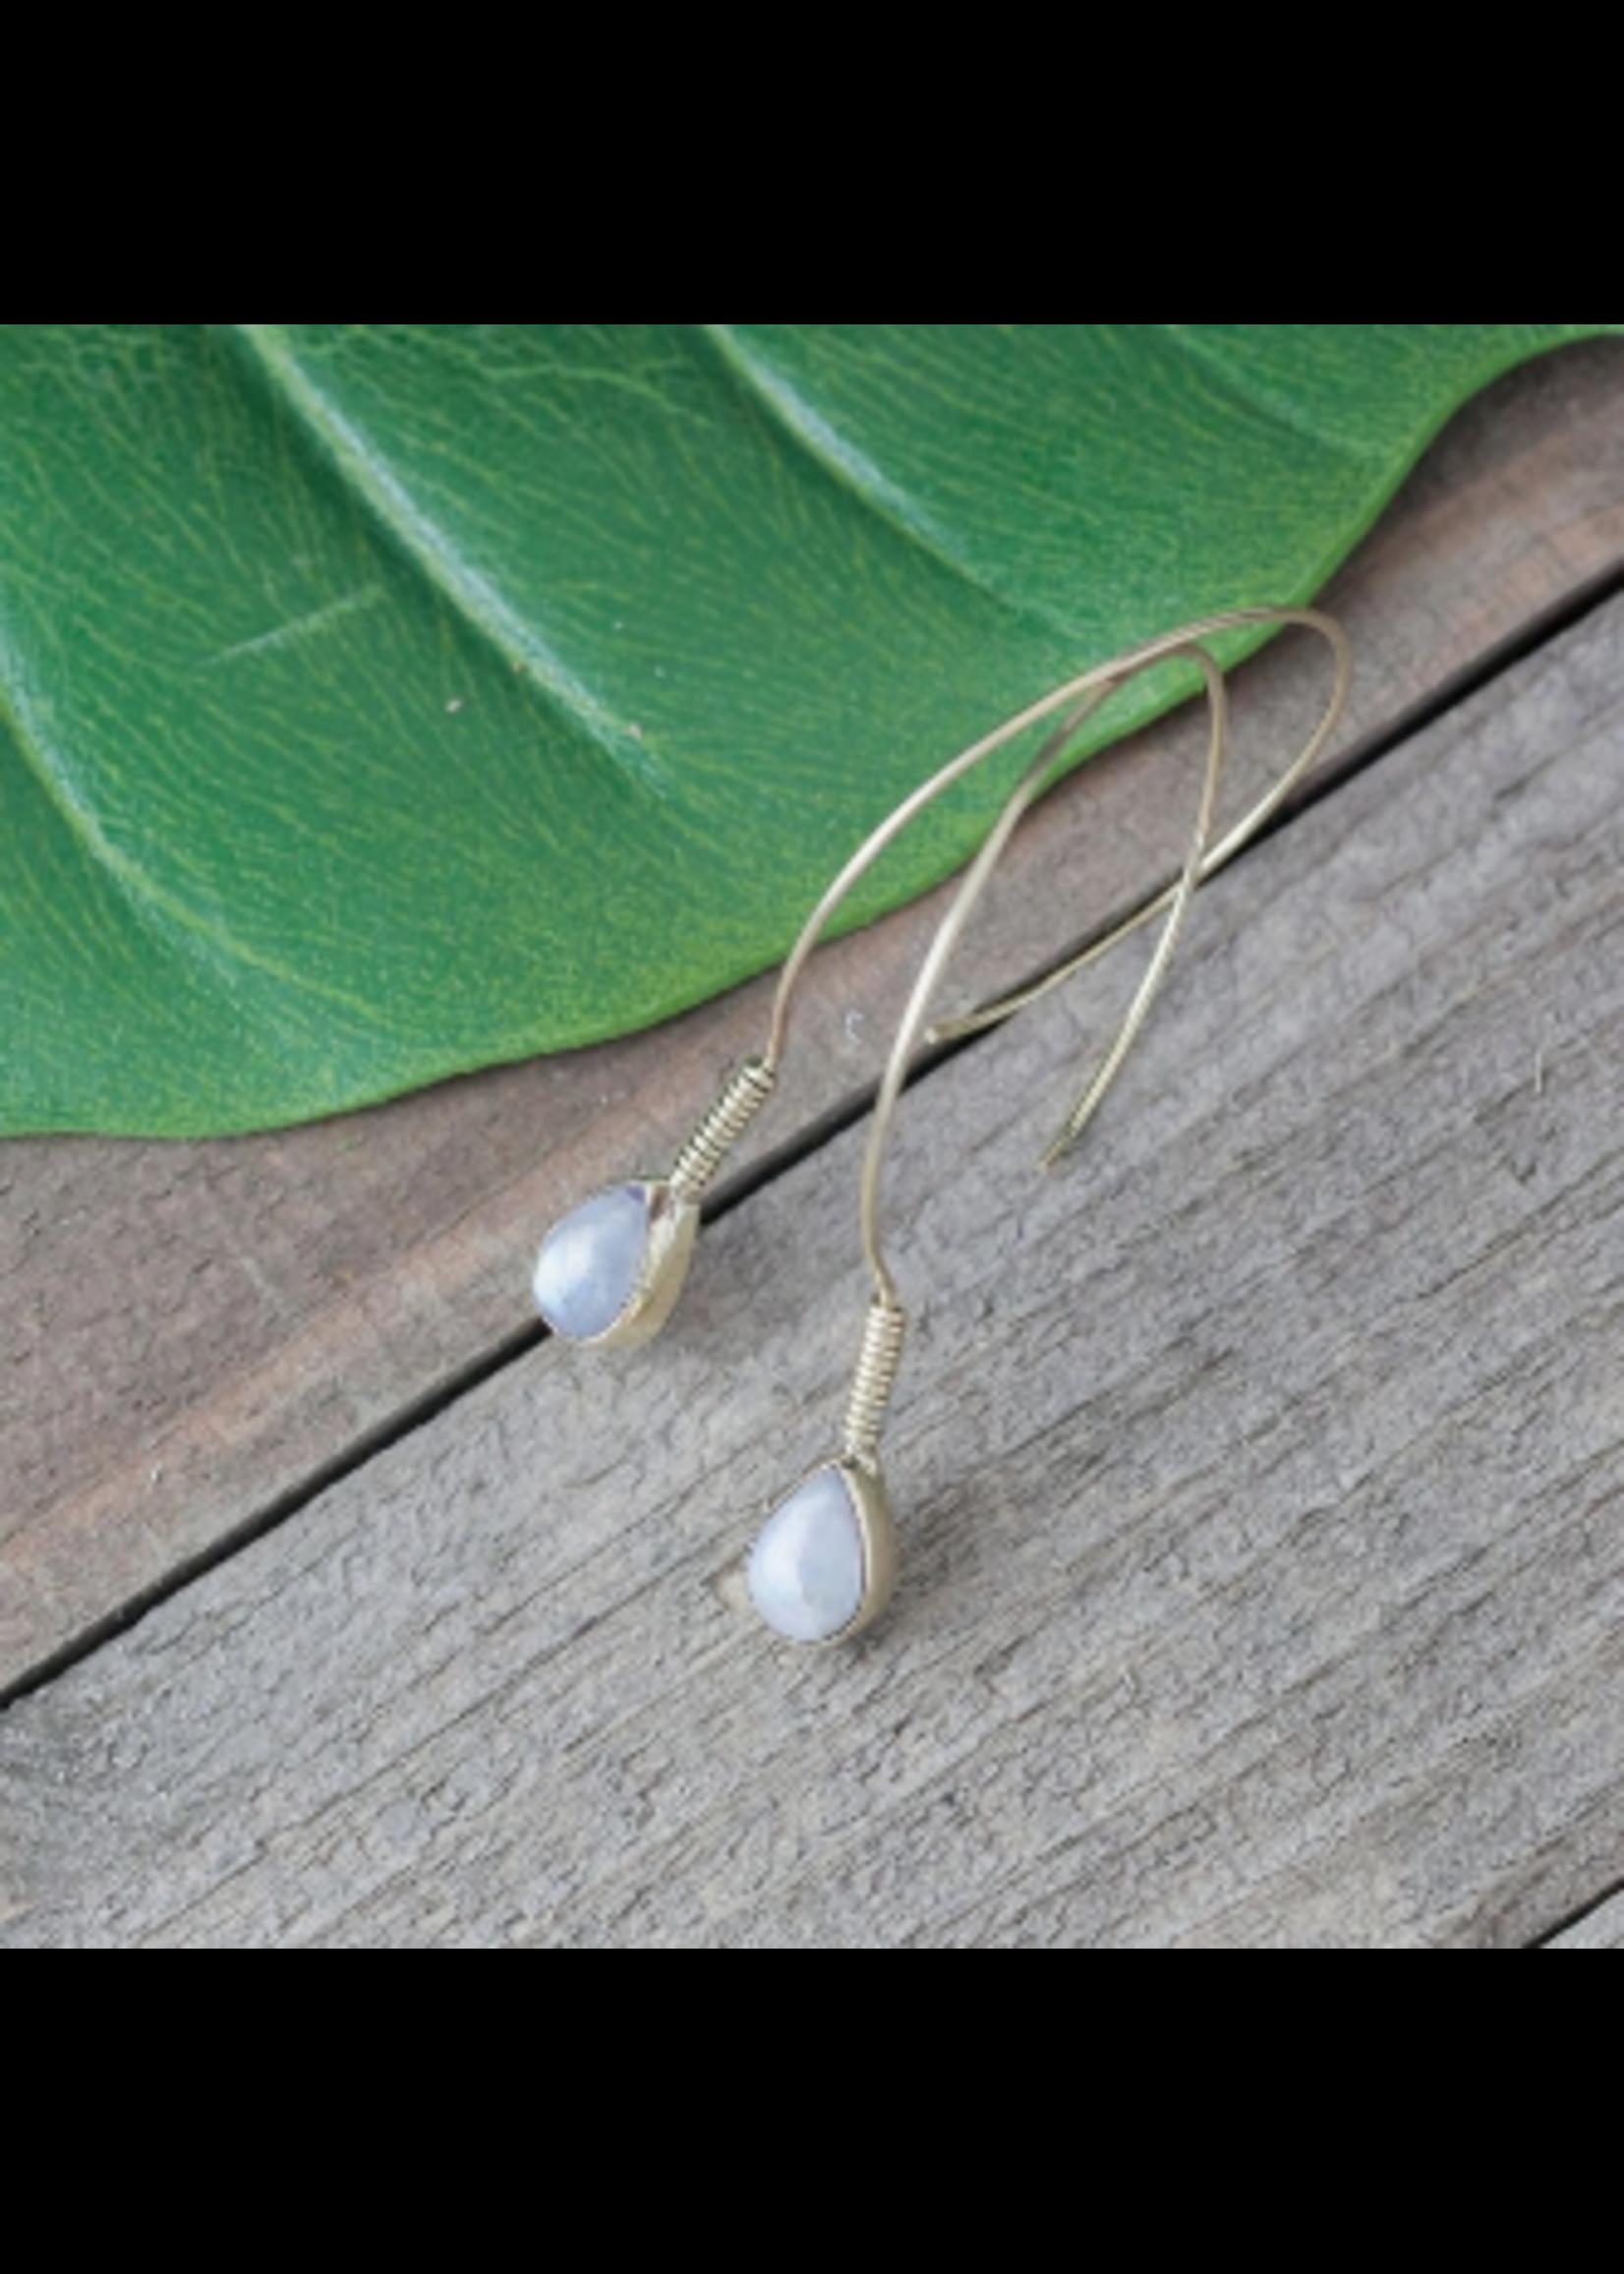 Baizaar Curled Stone Earring